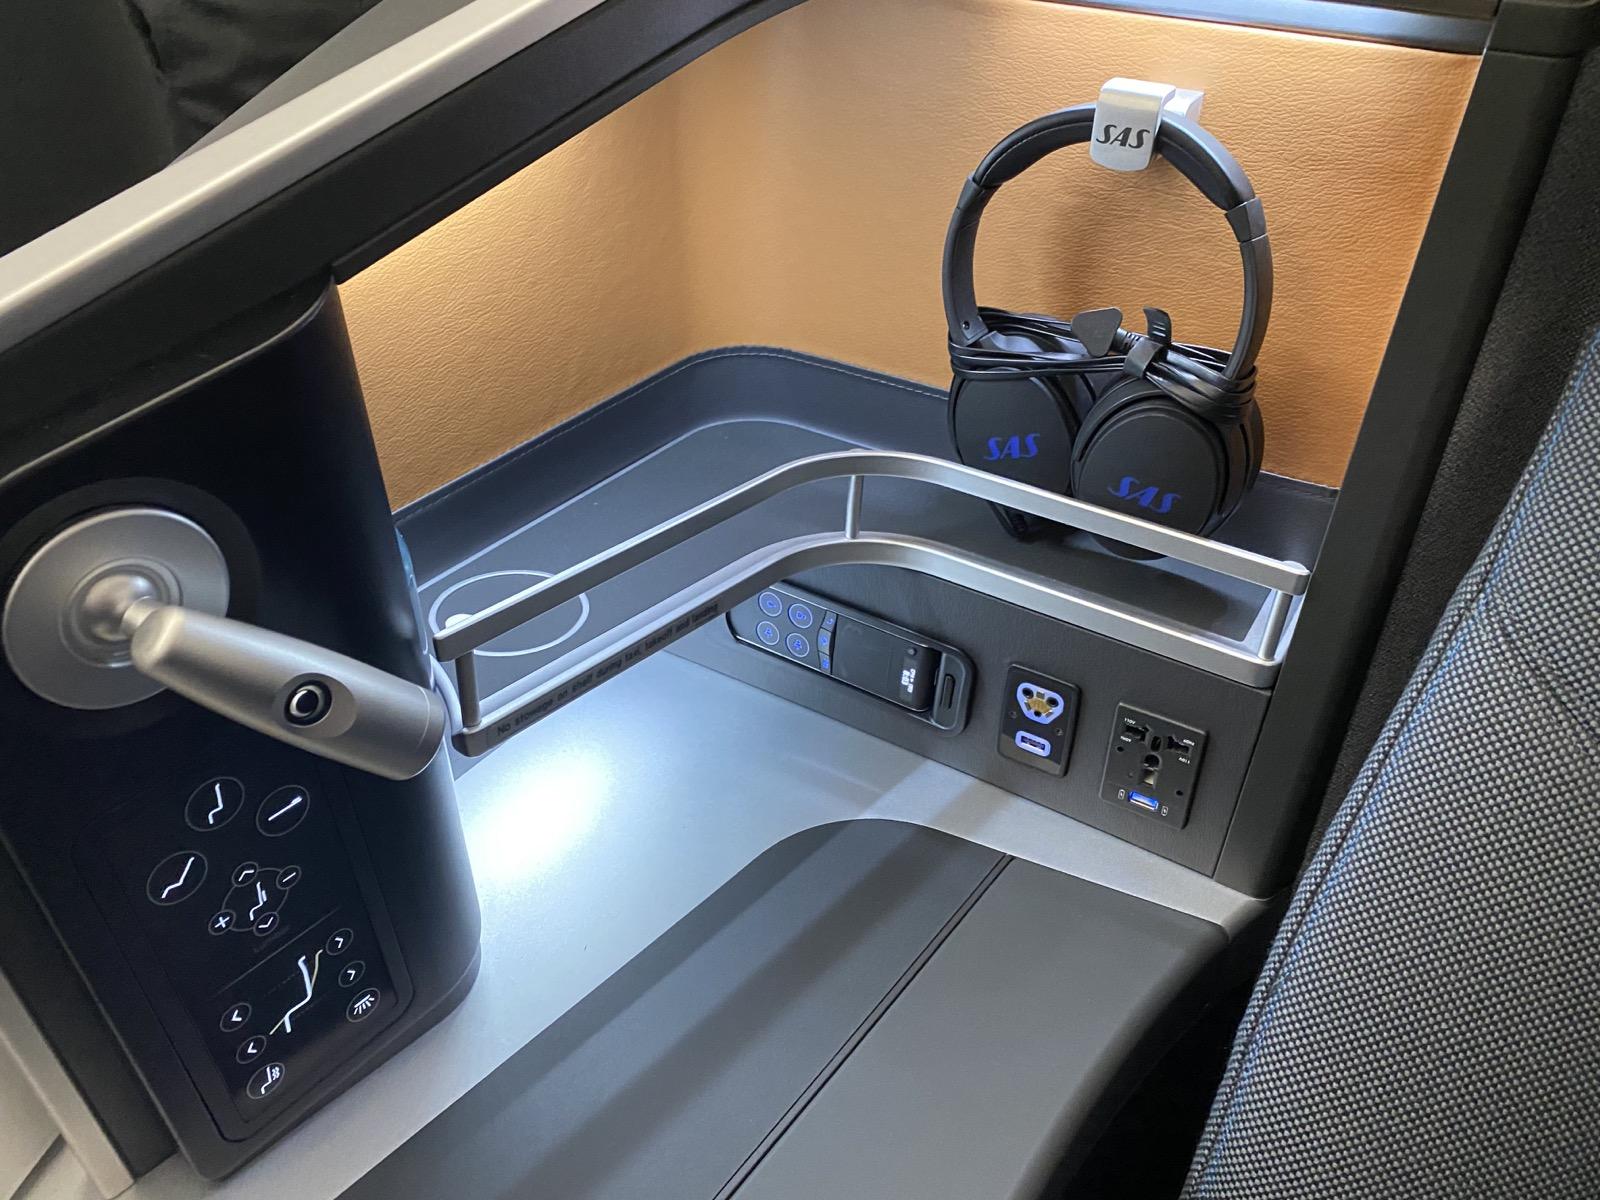 Seat Storage Area